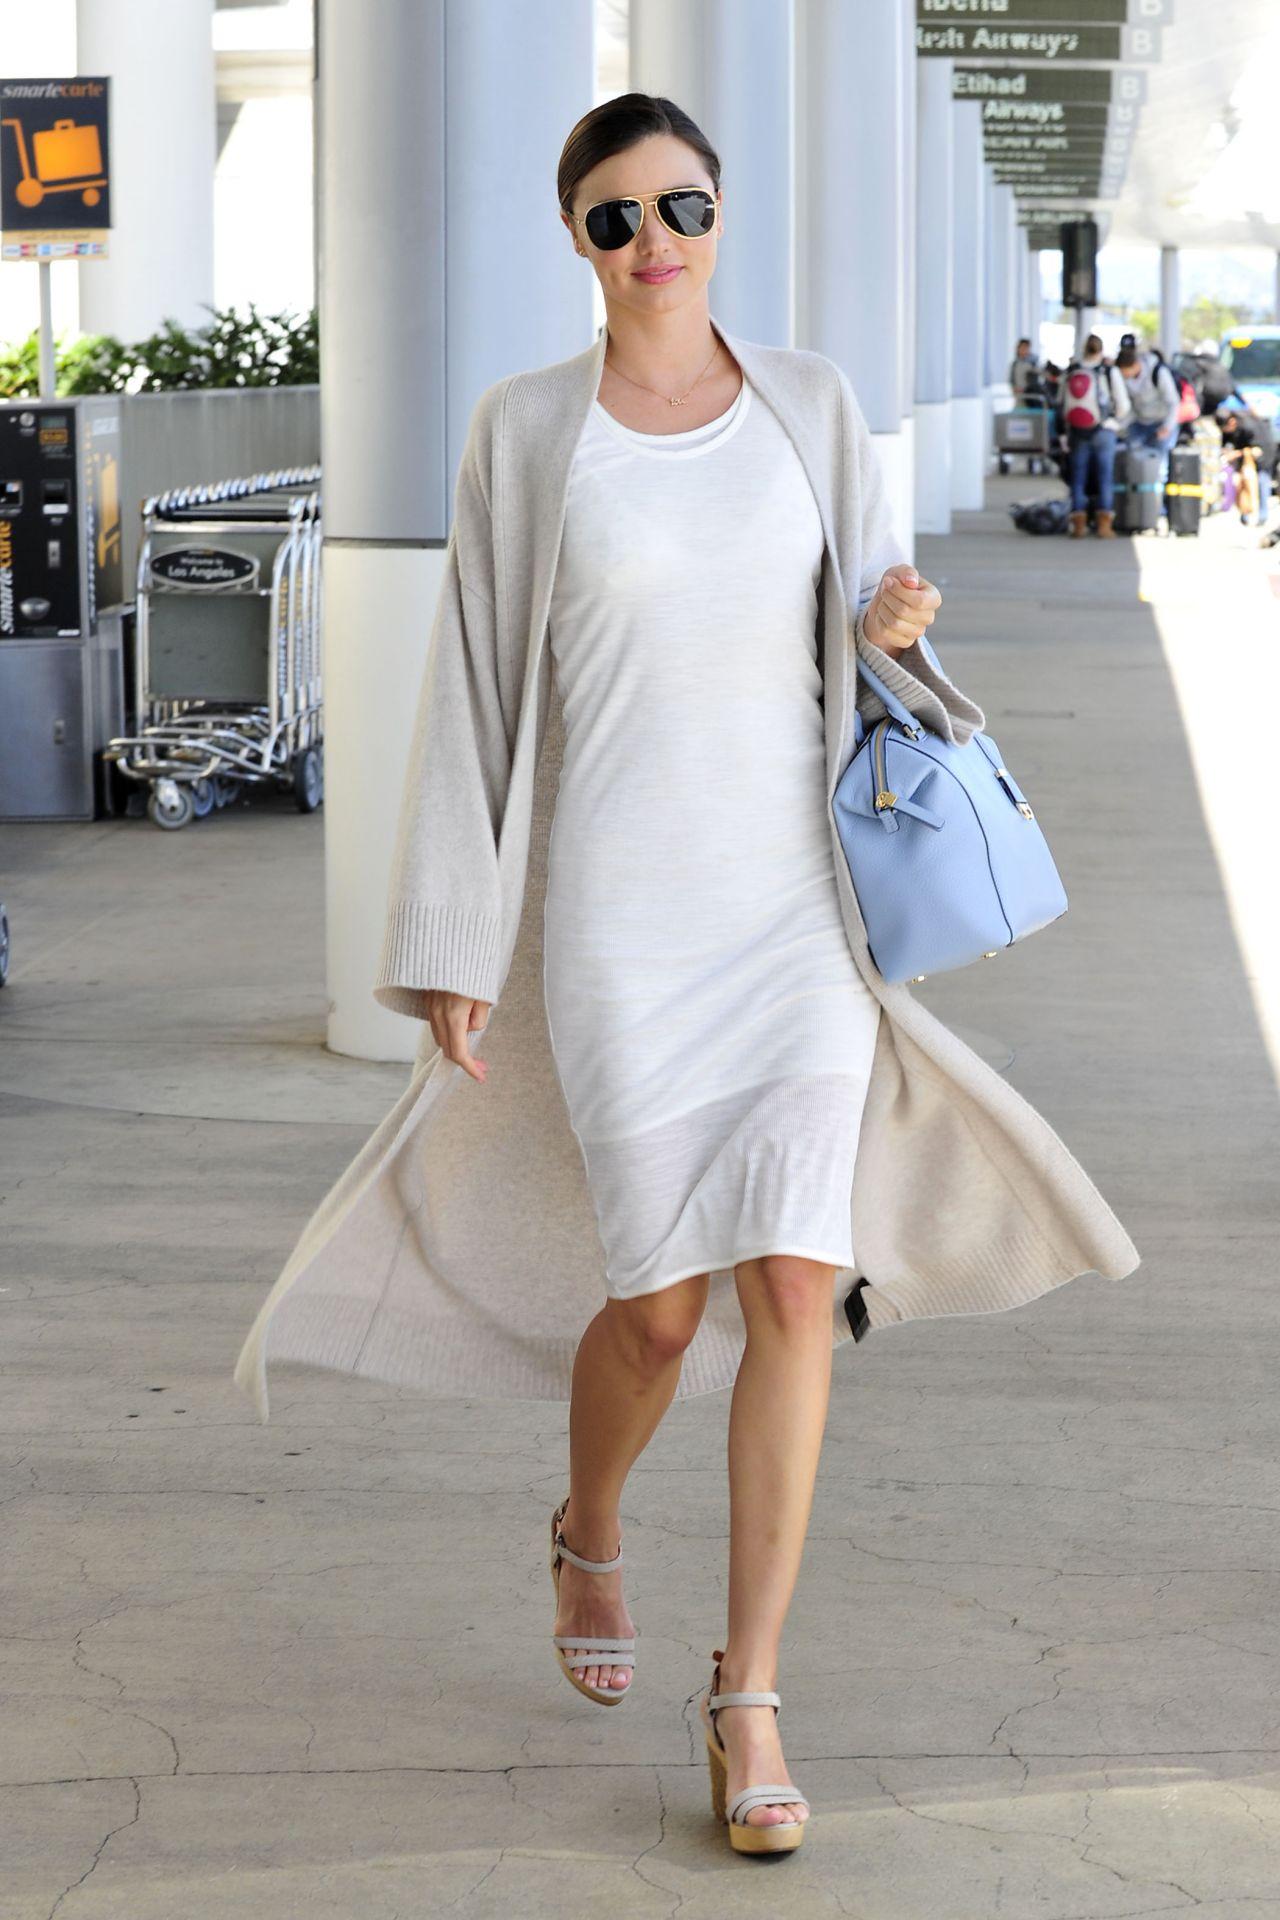 Fashion Fashion Magazine: At LAX Airport, April 2015